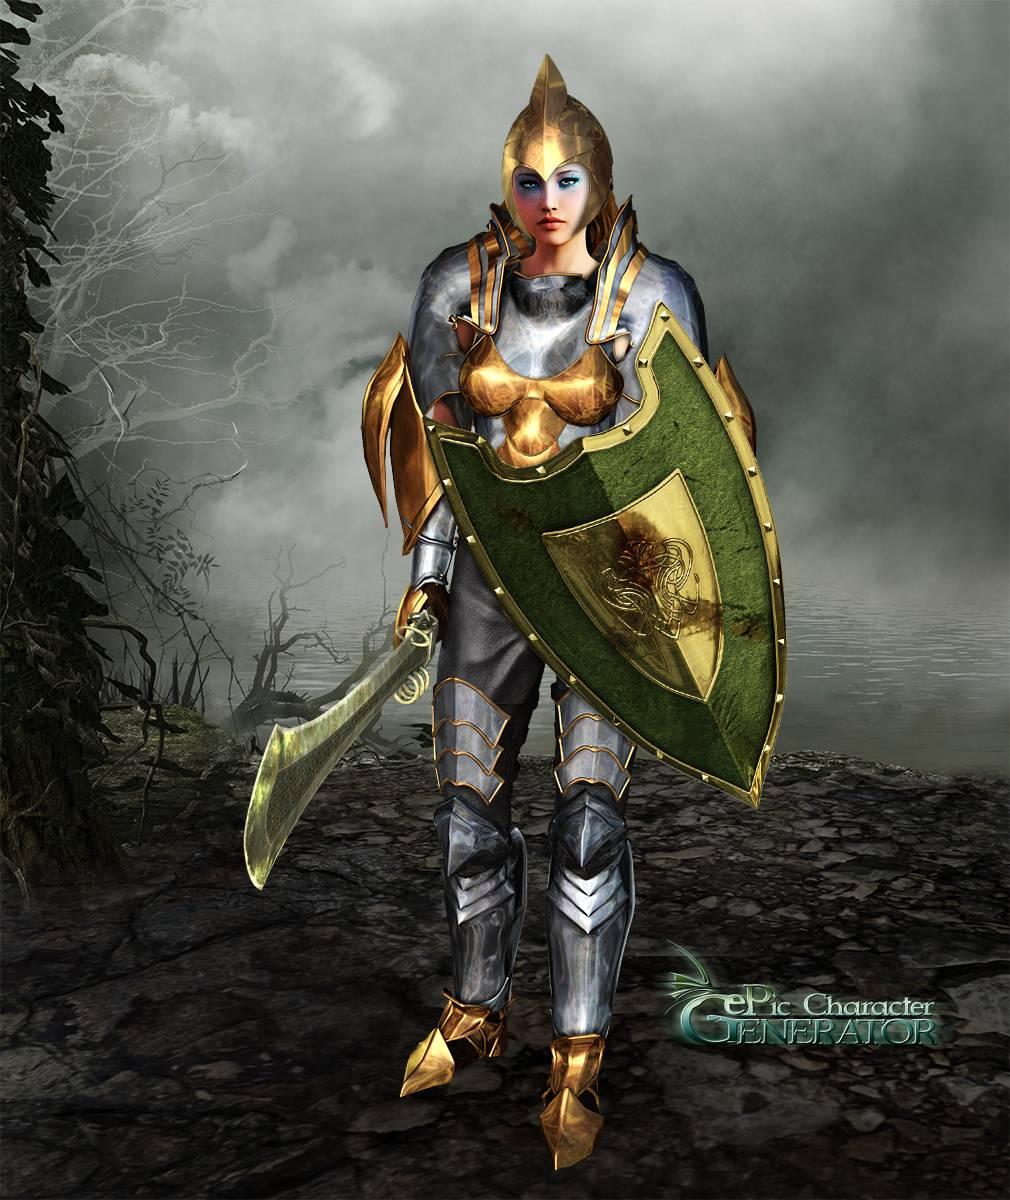 ePic Character Generator Season 2 Female Warrior Screenshot 14